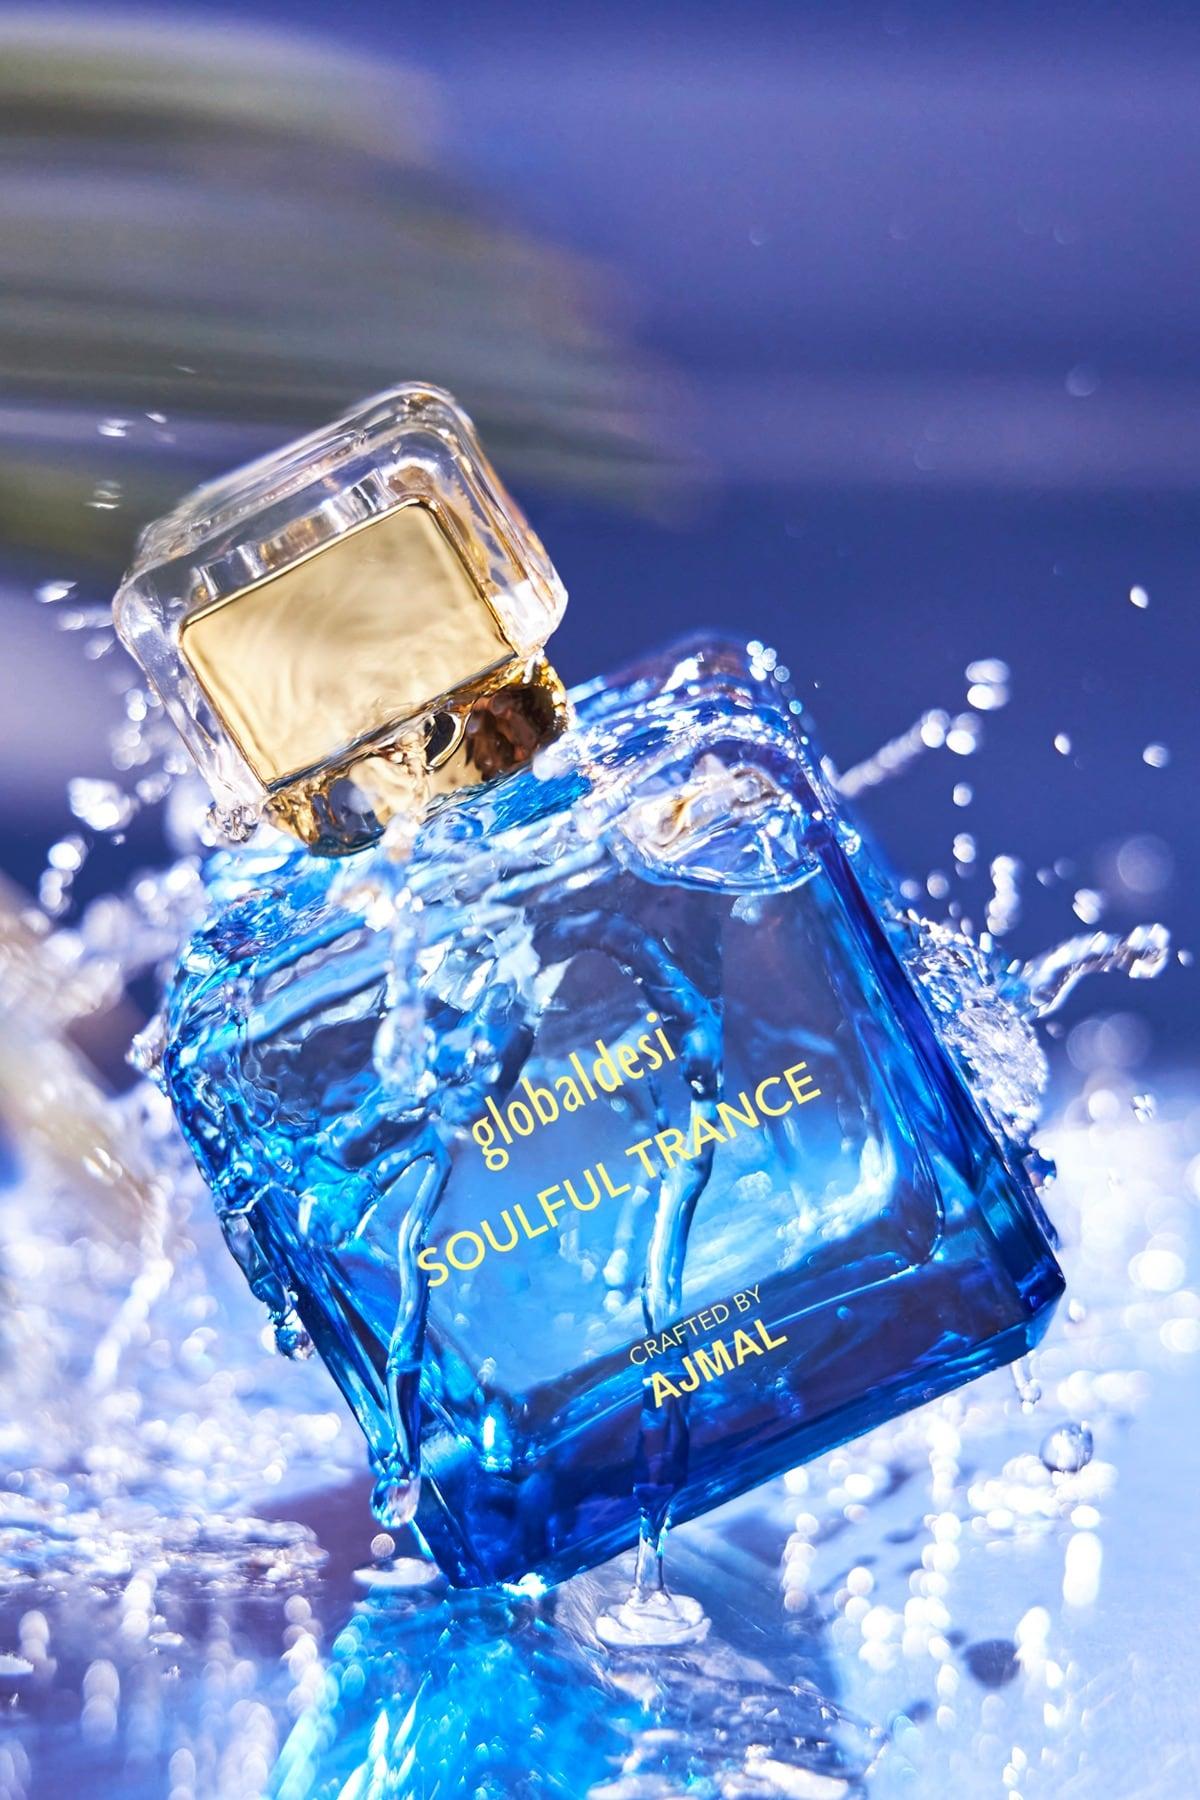 Global Desi | Soulful Trance Aquatic Woody Eau De Parfum